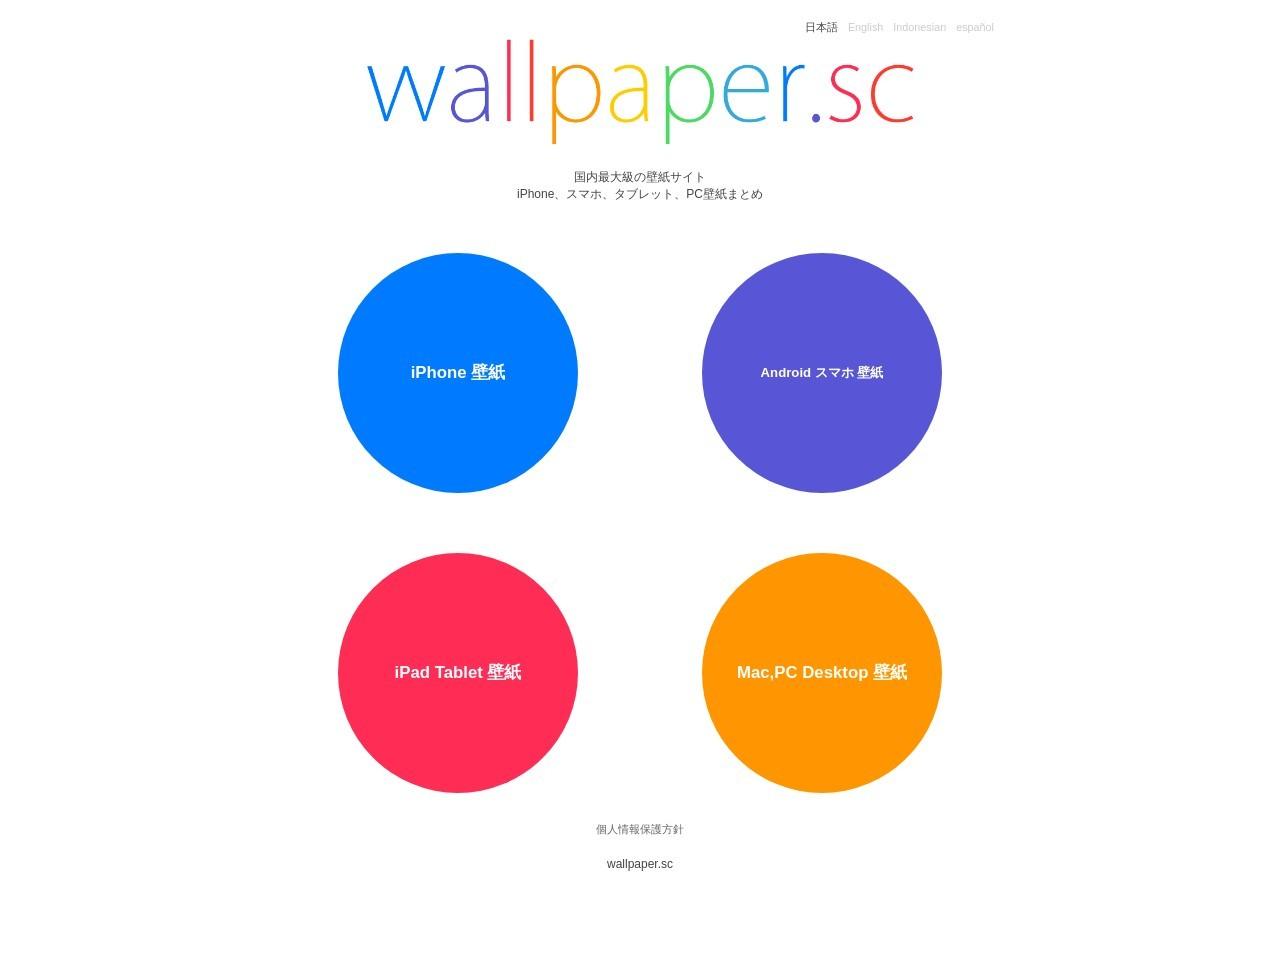 http://wallpaper.sc/desktop/